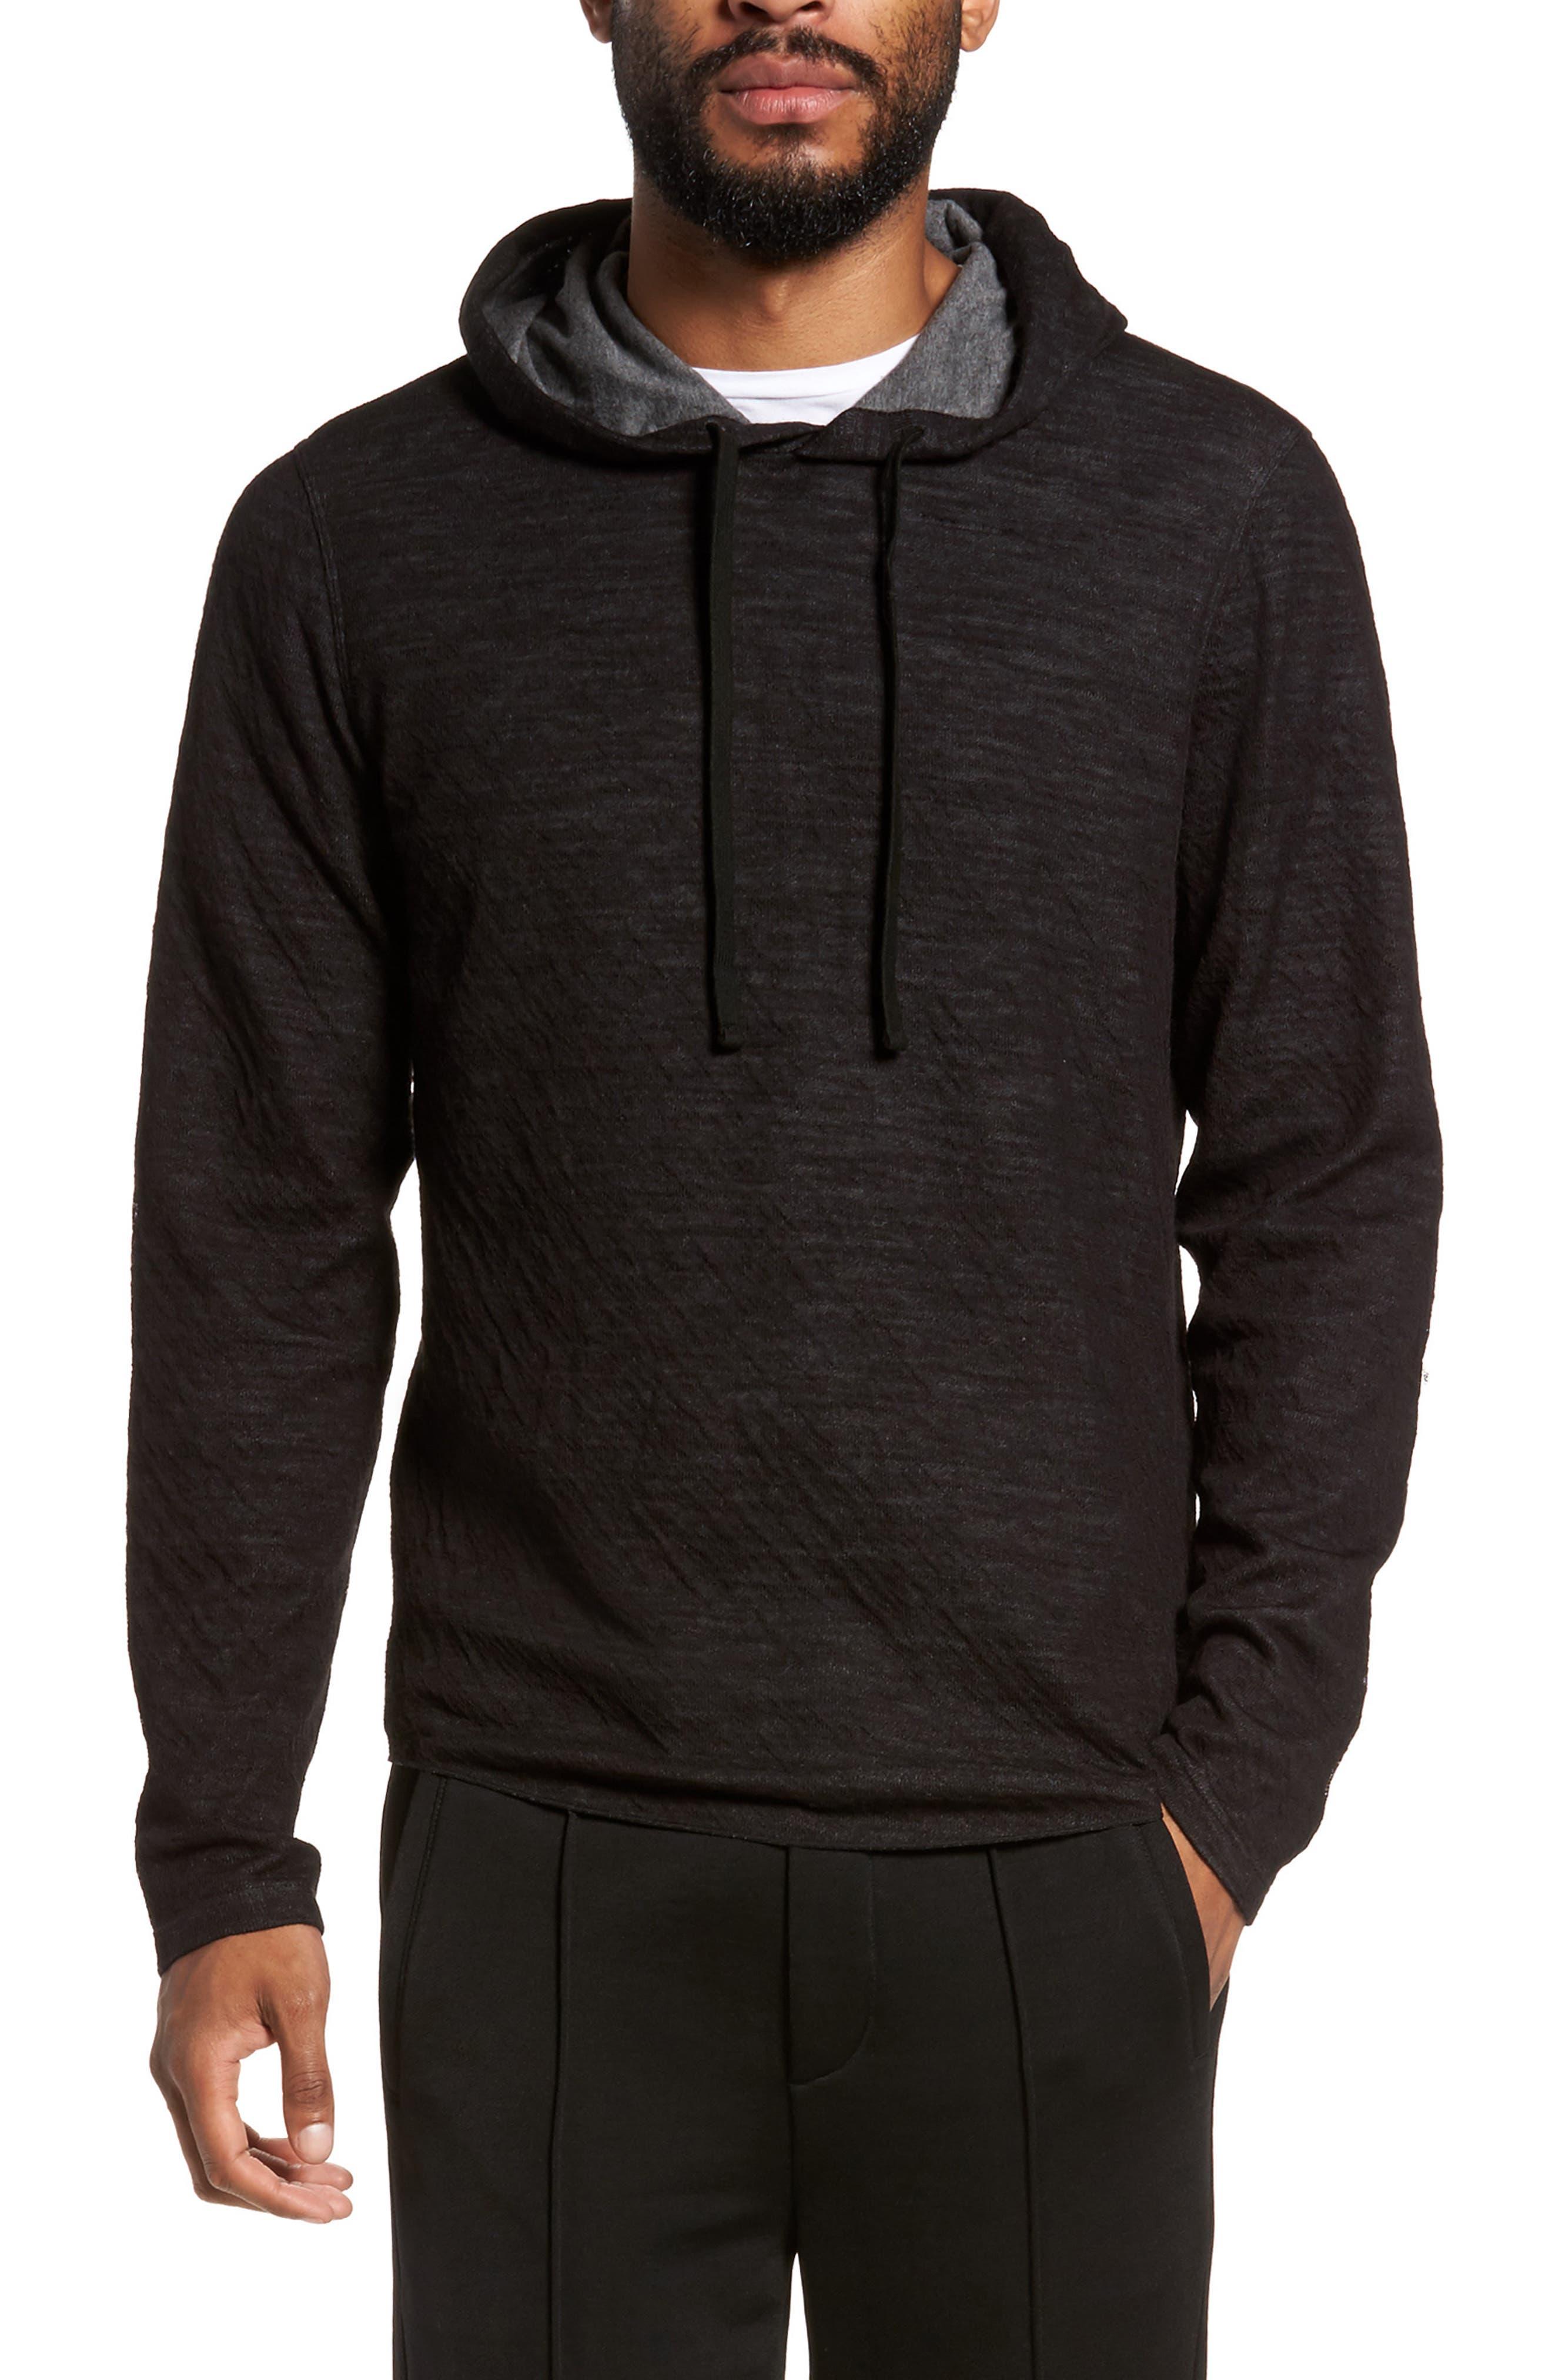 Contrast Double Knit Cotton & Wool Hoodie,                         Main,                         color, Black/ H Carbon